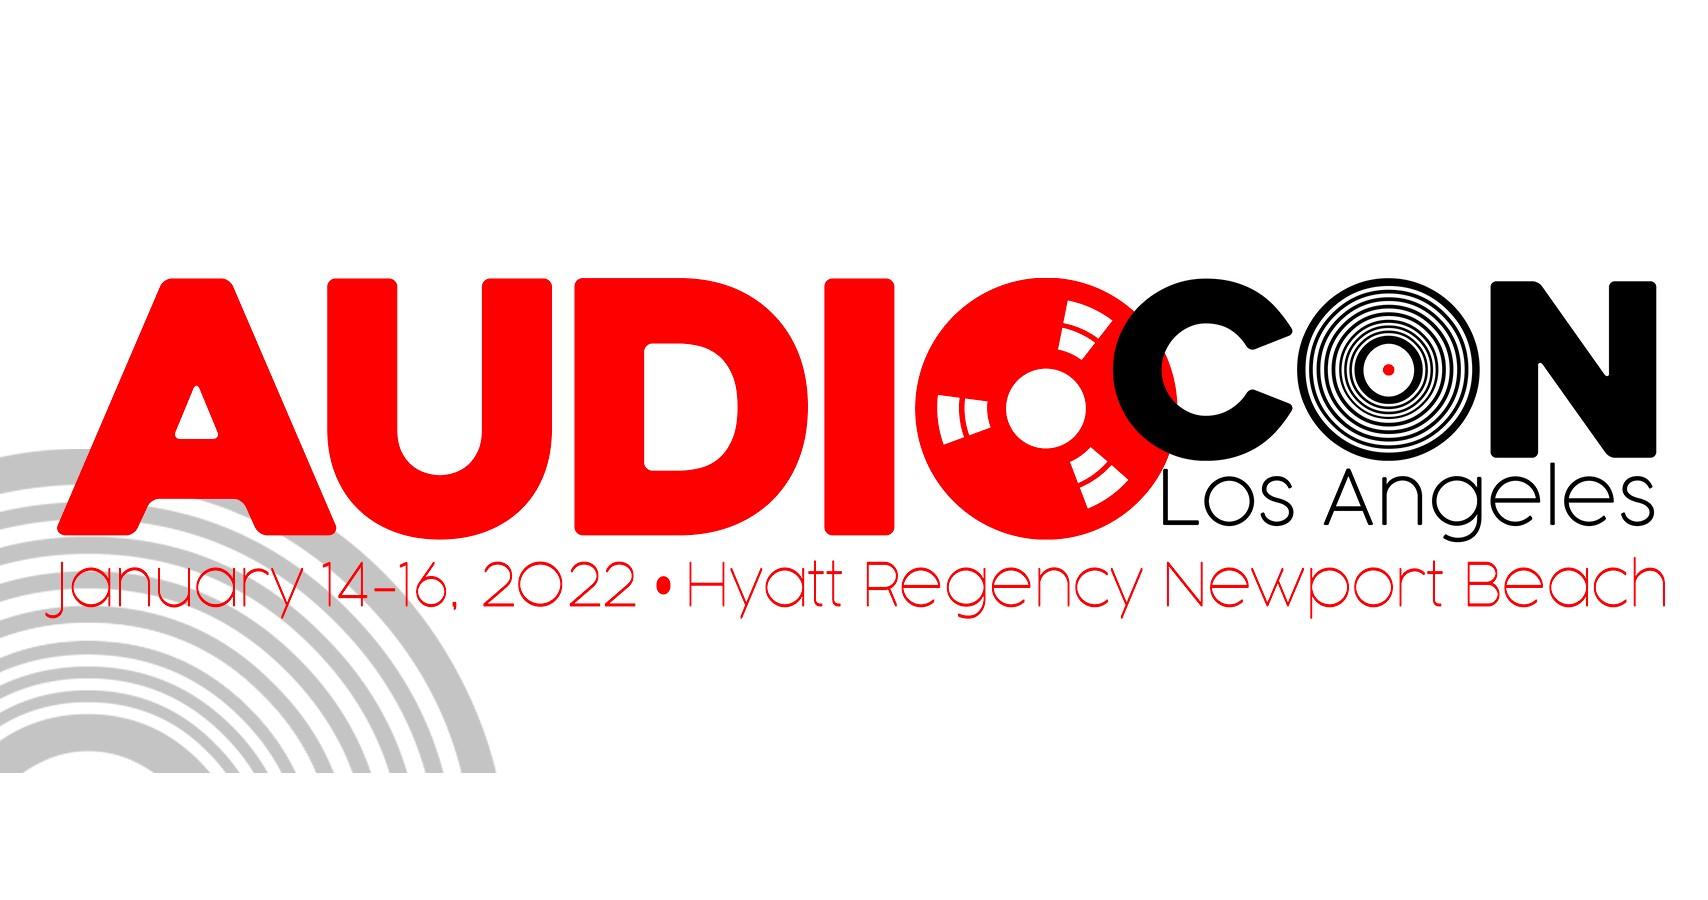 AudioConLA announced for Los Angeles 2022